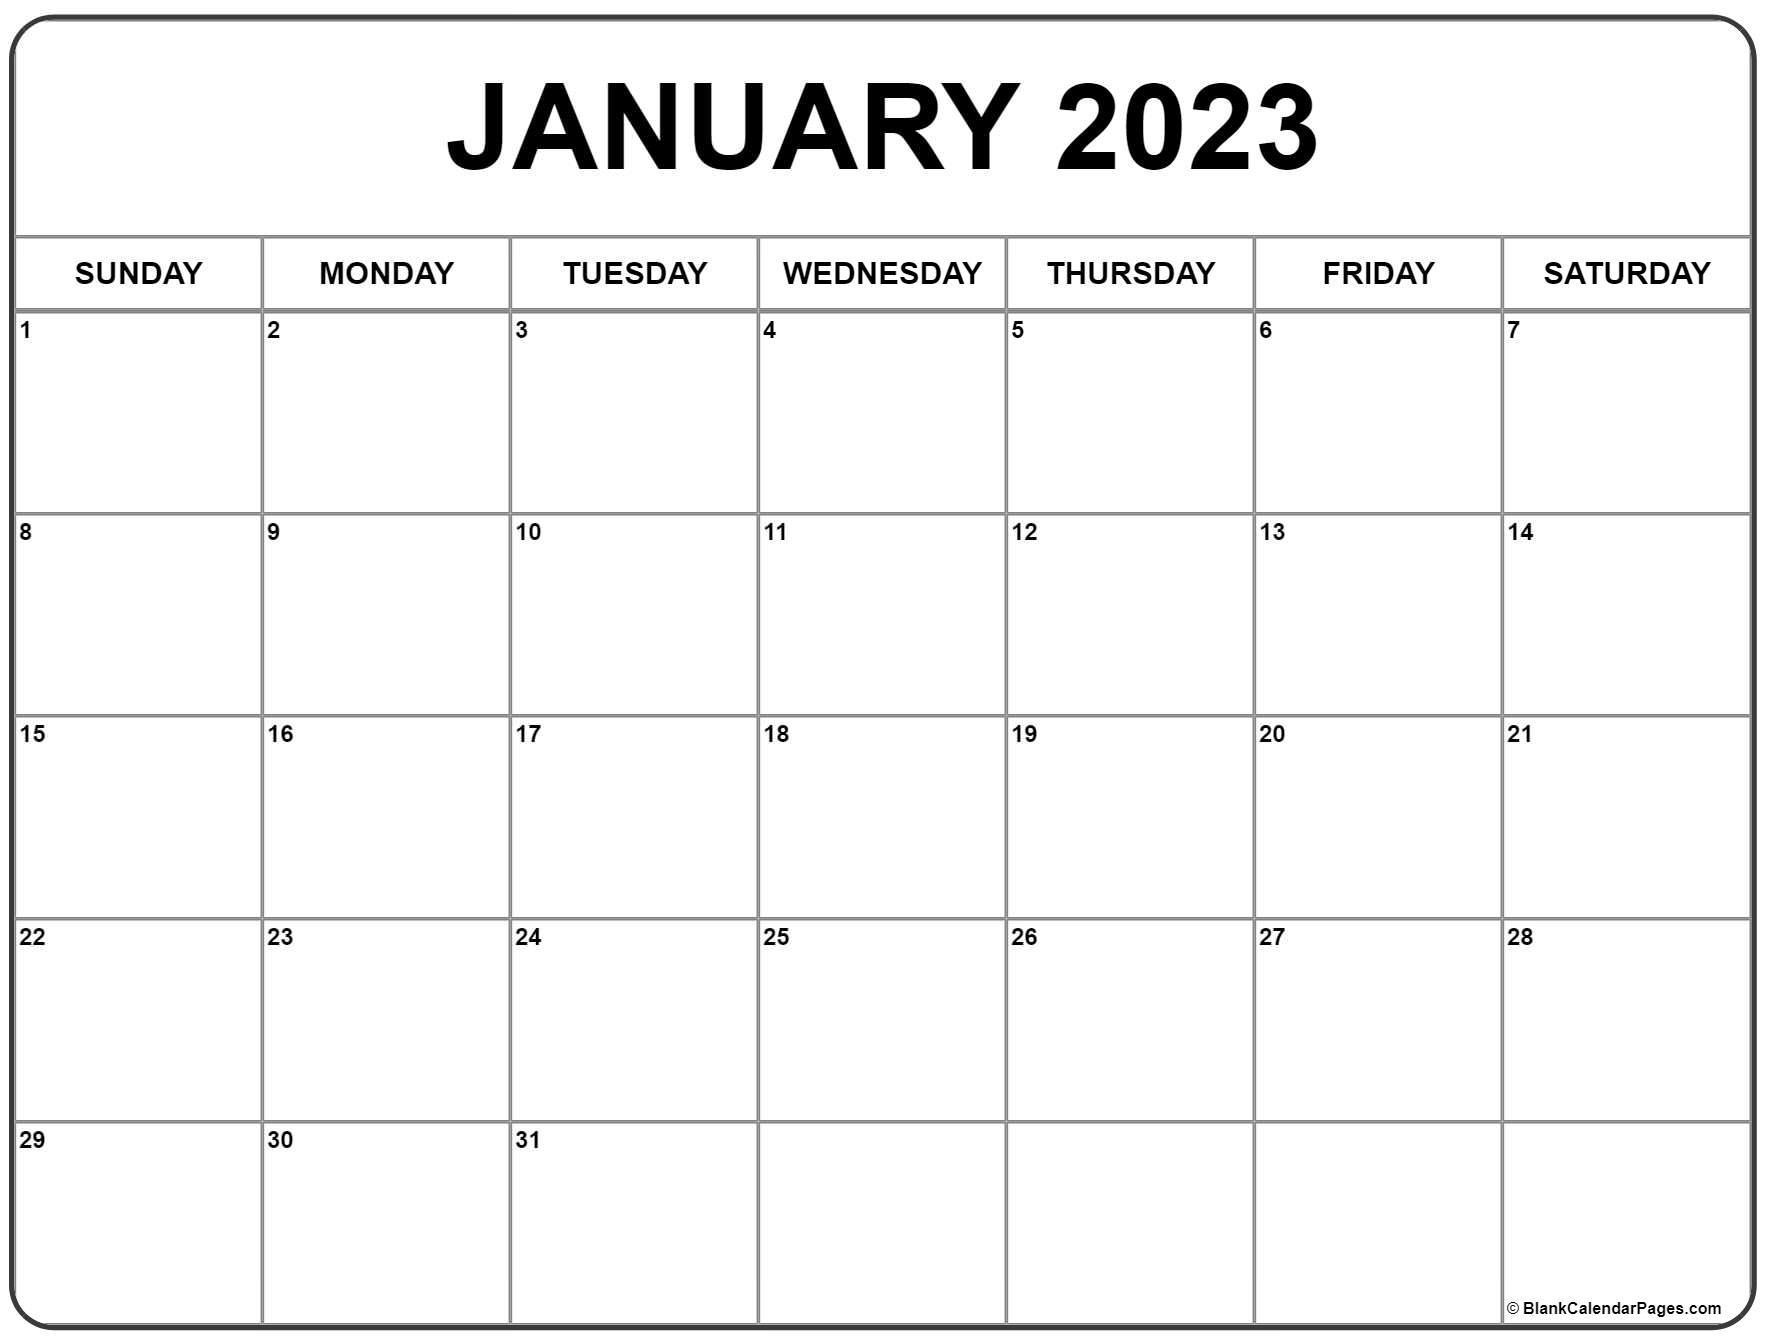 December 2022 And January 2023 Calendar.January 2023 Calendar Free Printable Calendar Templates